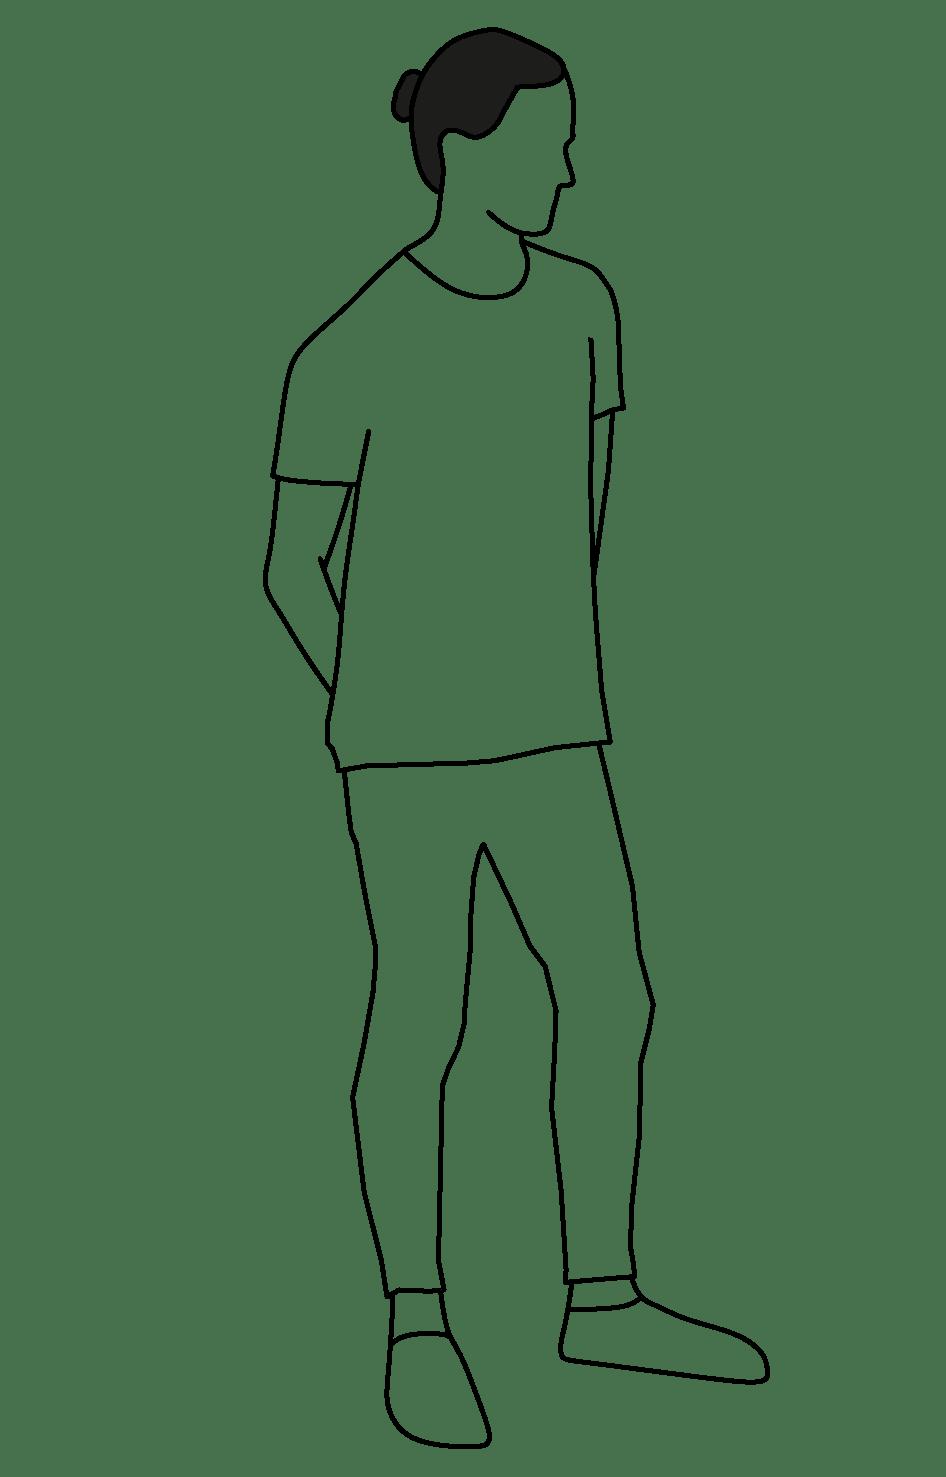 210910_outline wohnlabor_final-05